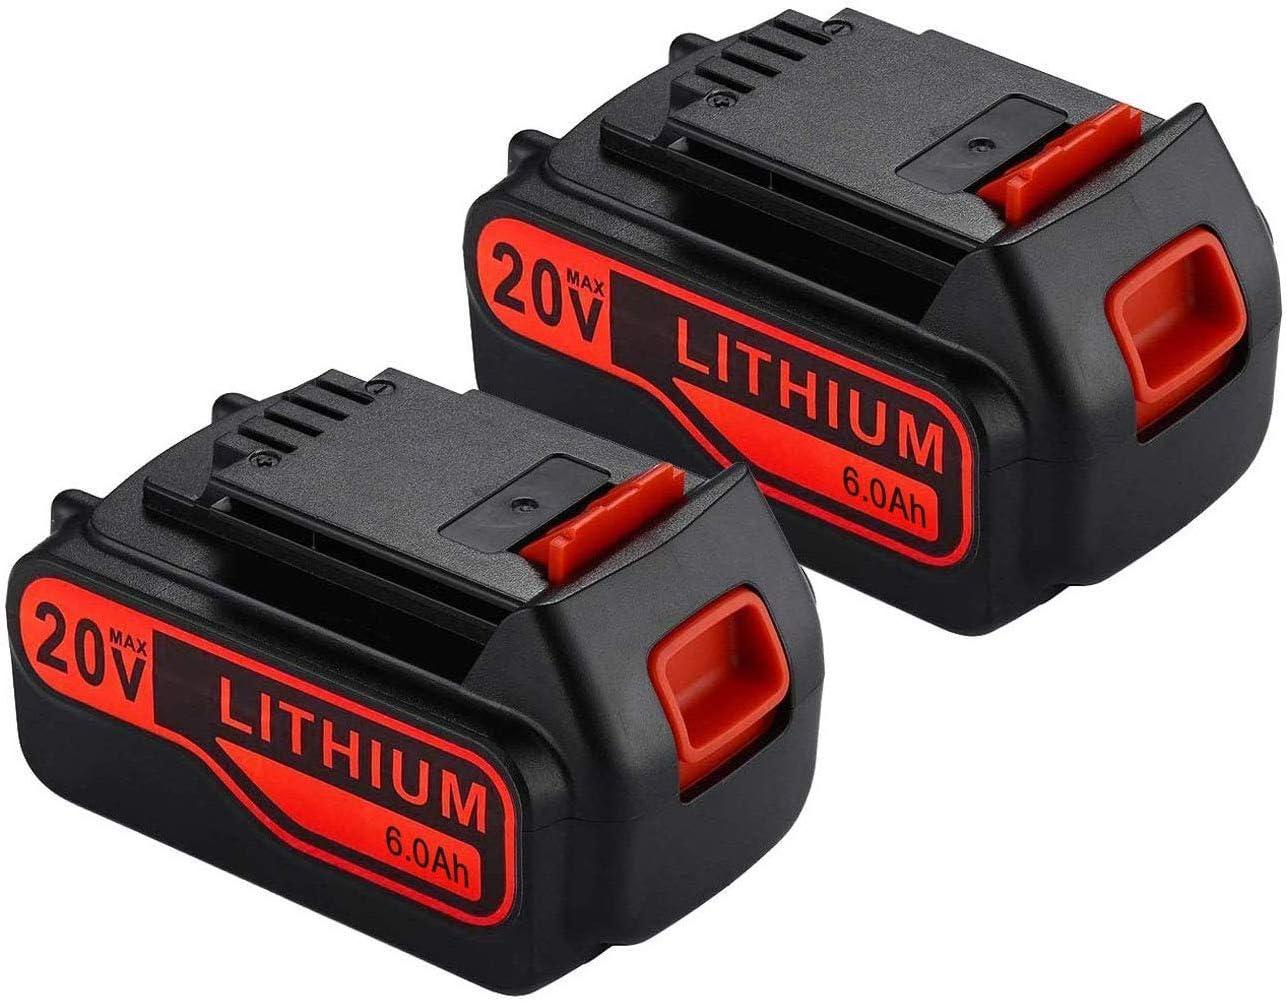 2Pack LBXR20 6.0Ah 20V MAX Replacement Battery for Black and Decker 20V Lithium Battery LBXR20 LBXR20-OPE LB20 LBX20 LBX4020 LB2X4020-OPE